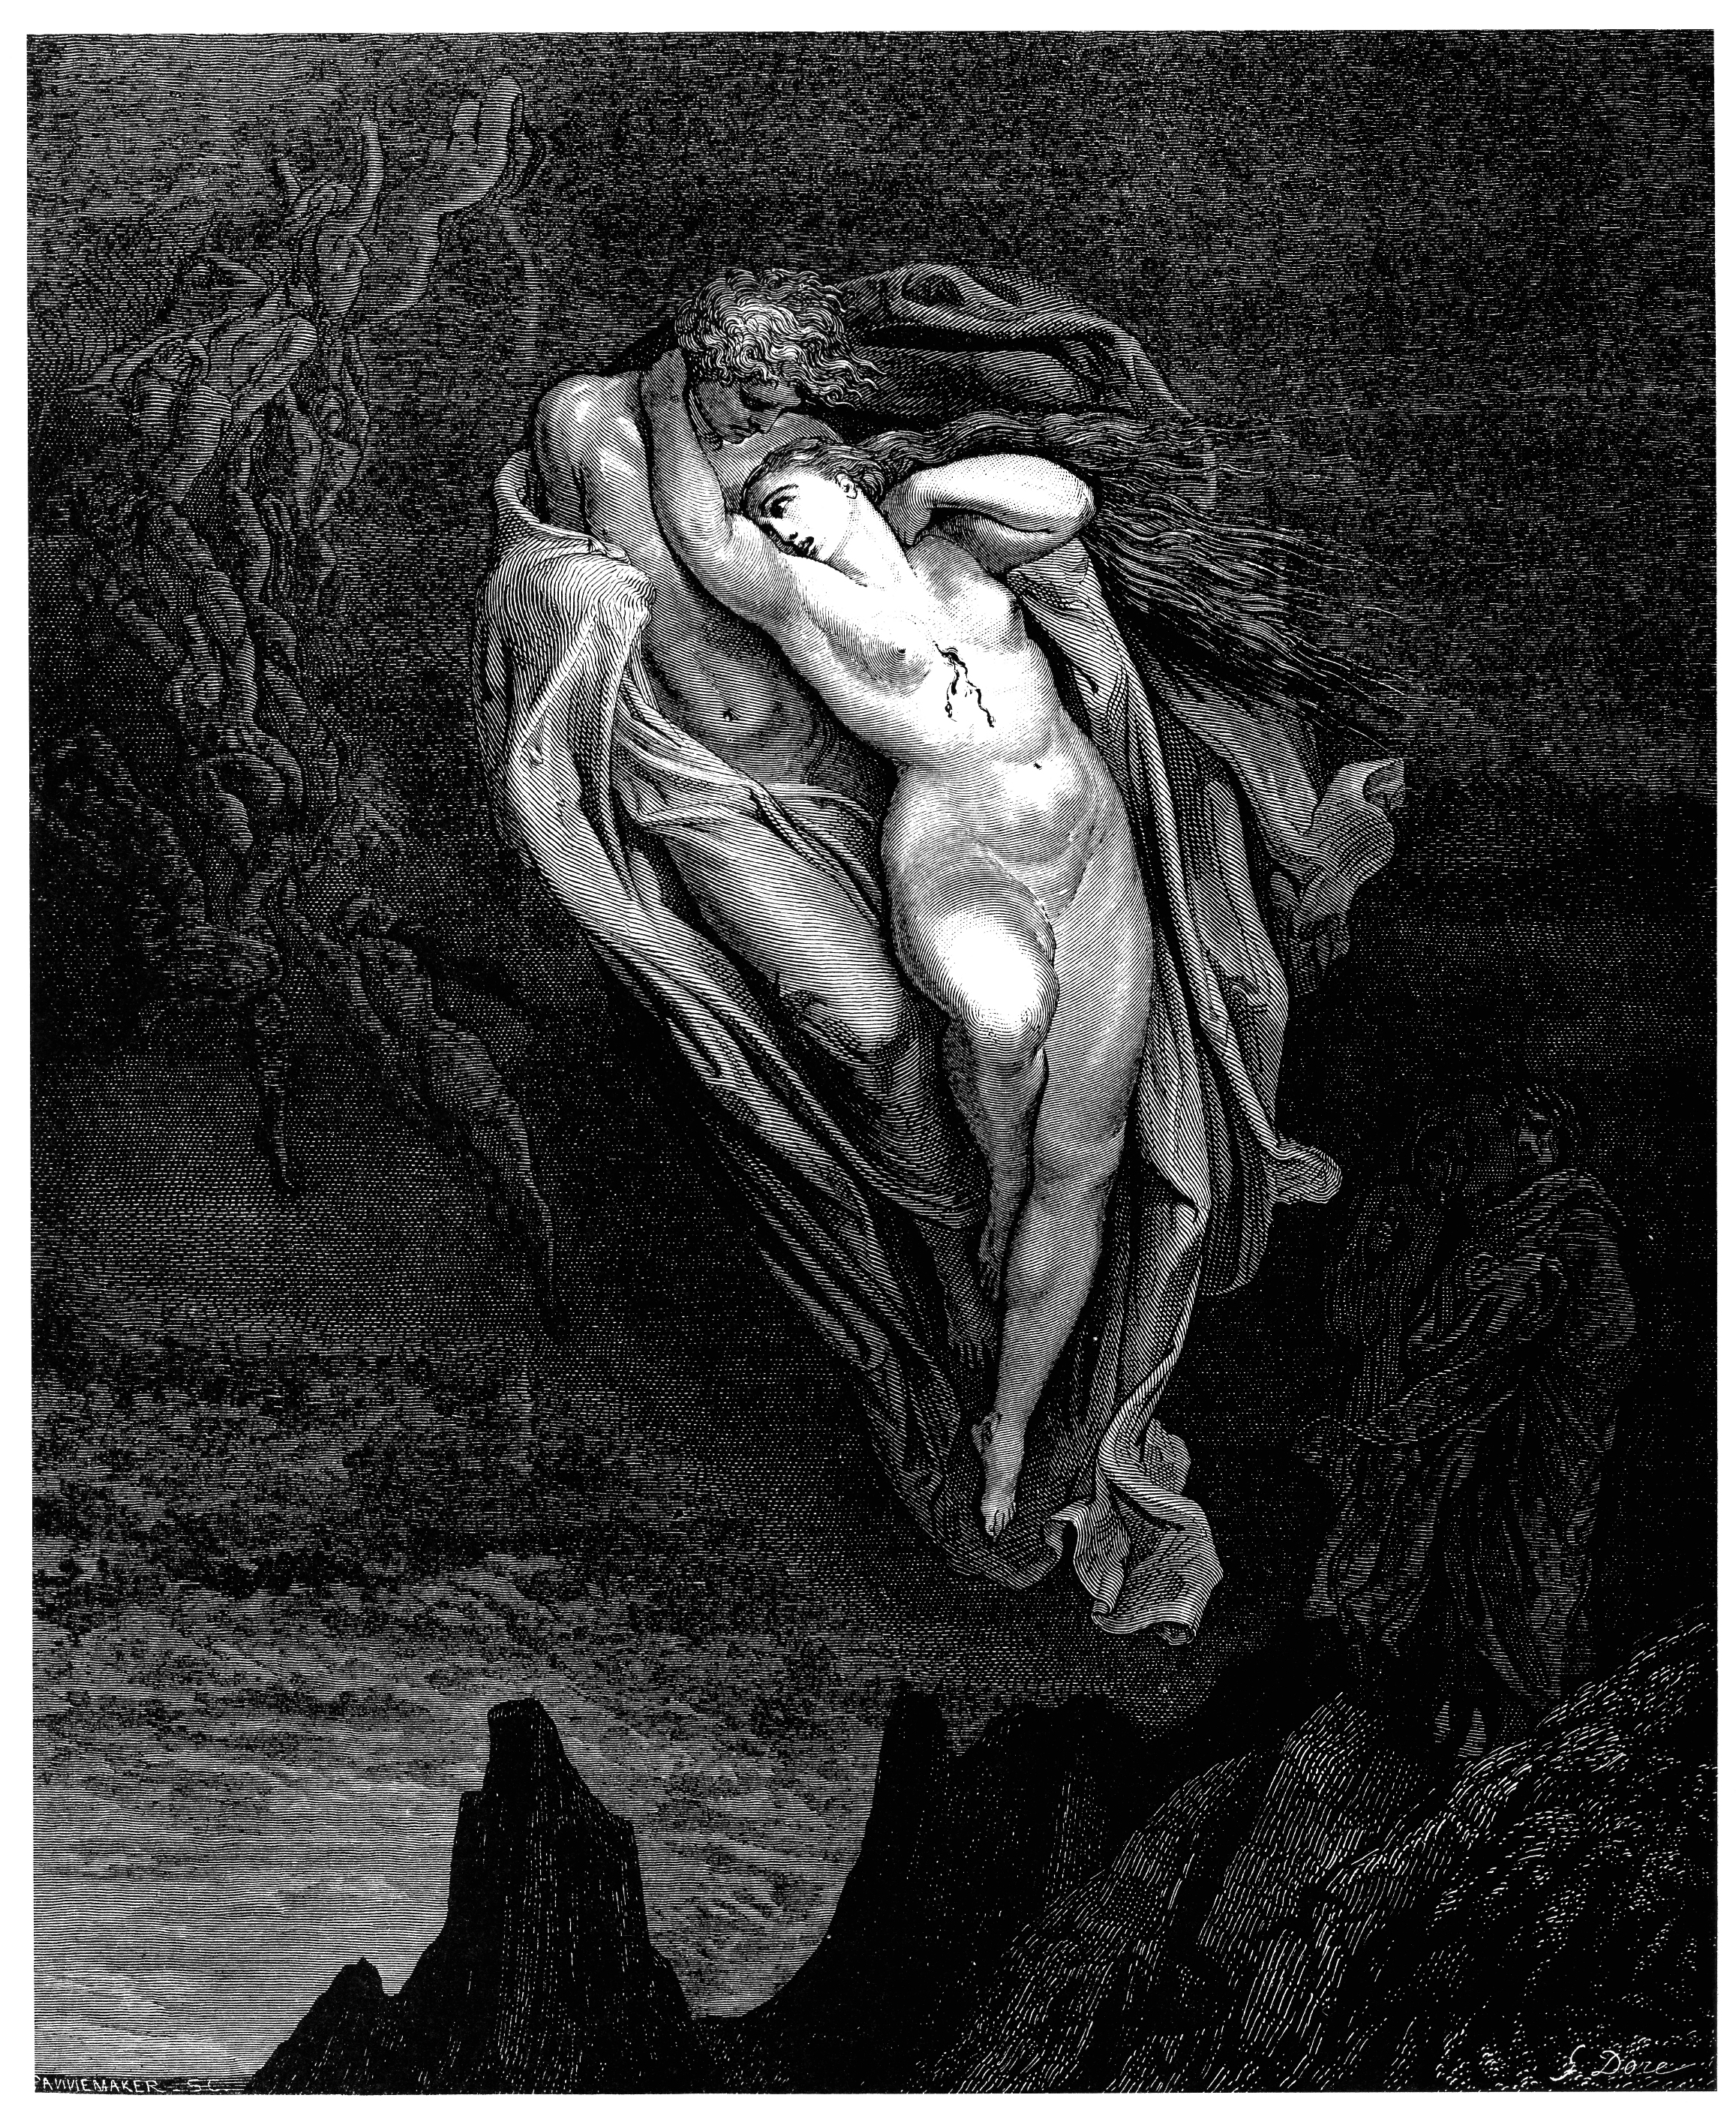 103 OB23 Gustave_Doré_-_Dante_Alighieri_-_Inferno_-_Plate_15_(Canto_V_-_Francesca_di_Rimini).jpg